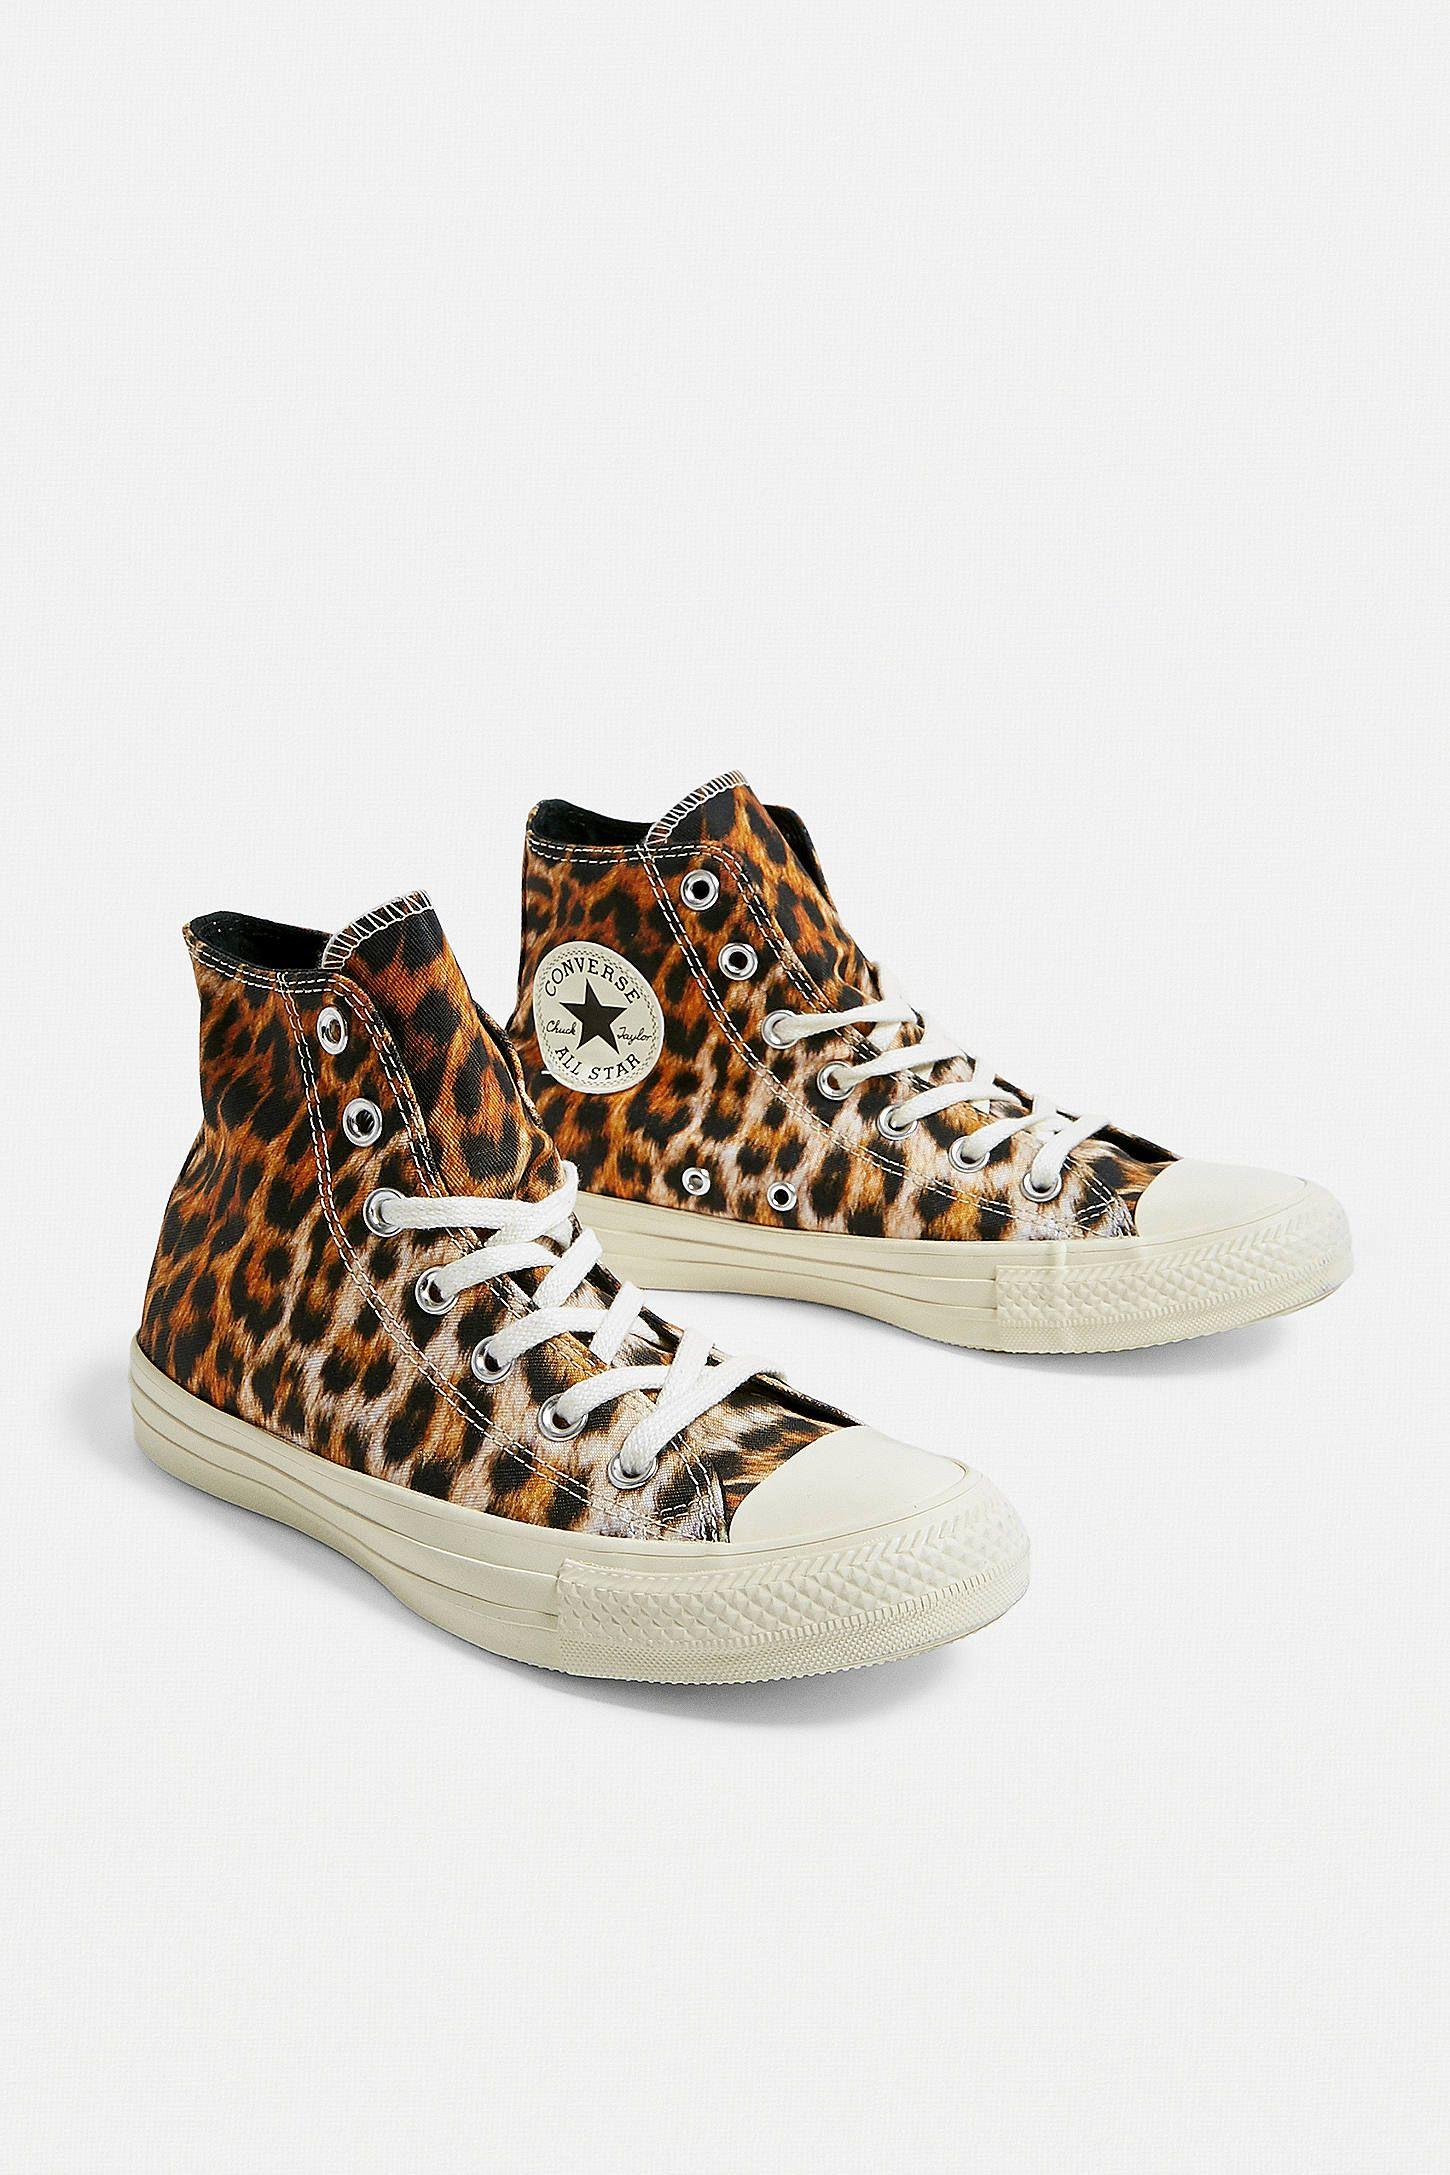 Converse All Star Chuck Taylor Leopard